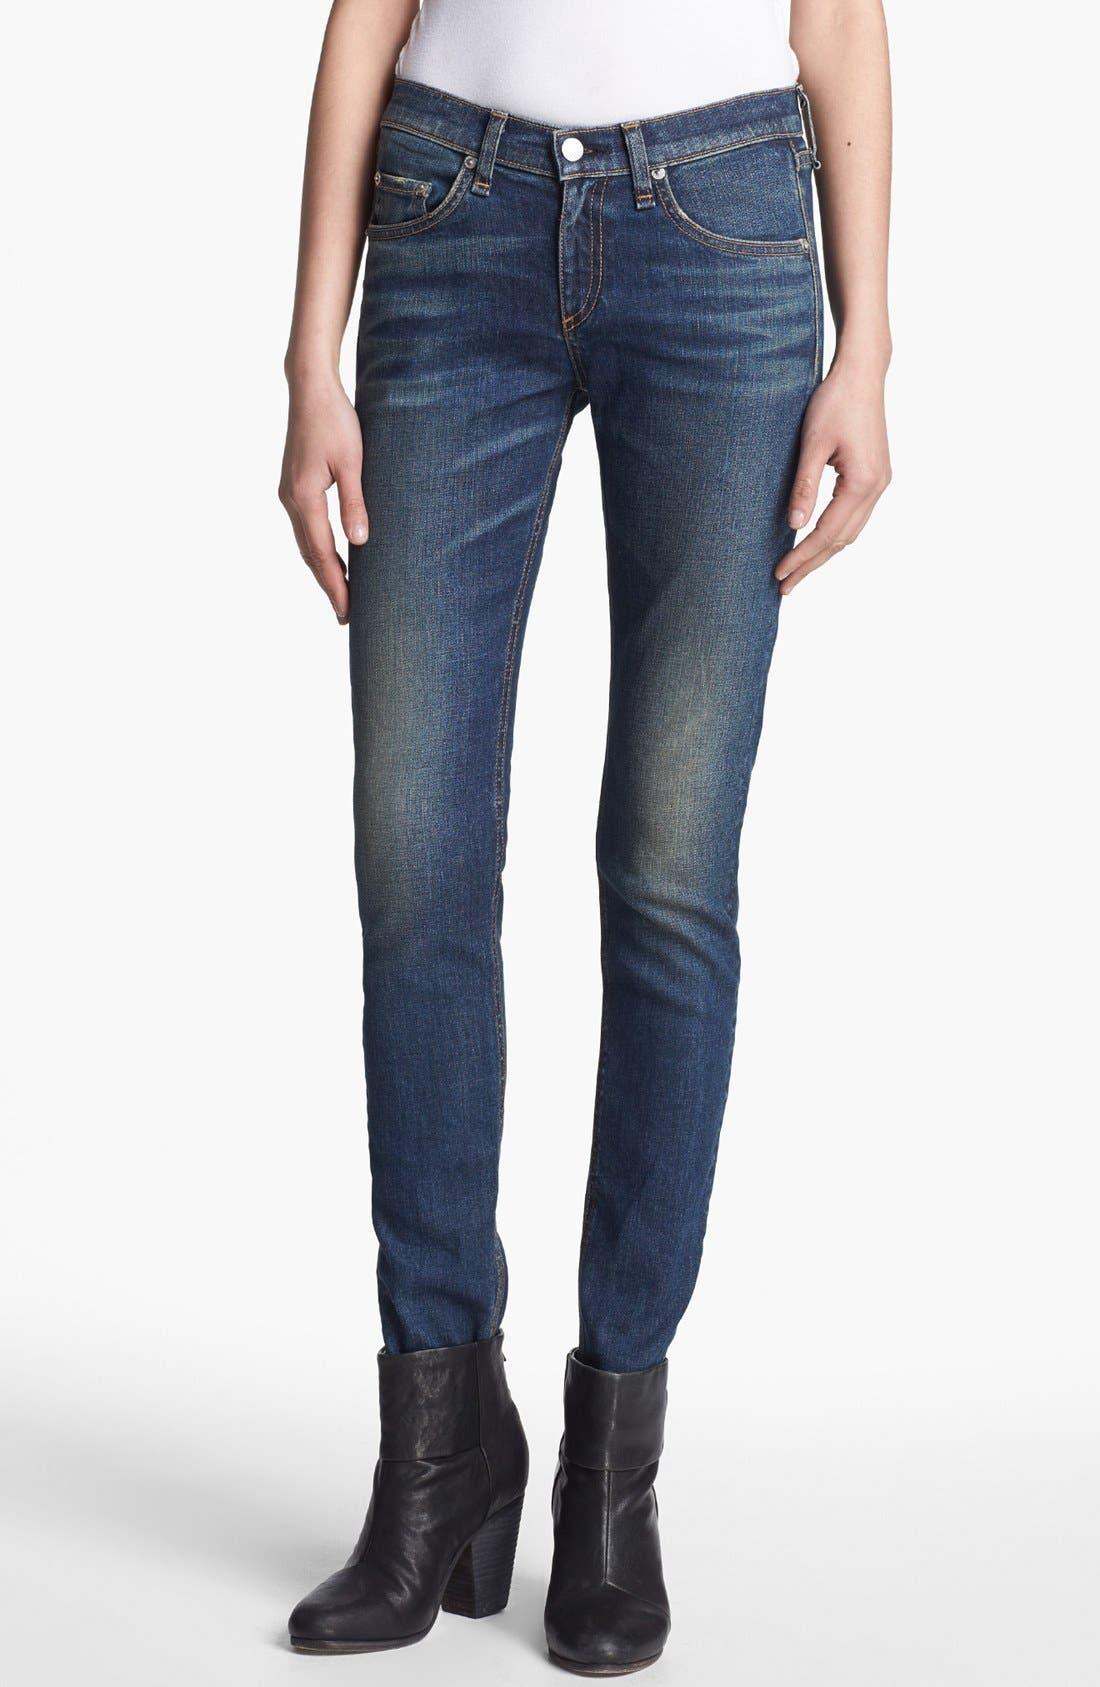 Alternate Image 1 Selected - rag & bone/JEAN Skinny Stretch Jeans (Stratham)